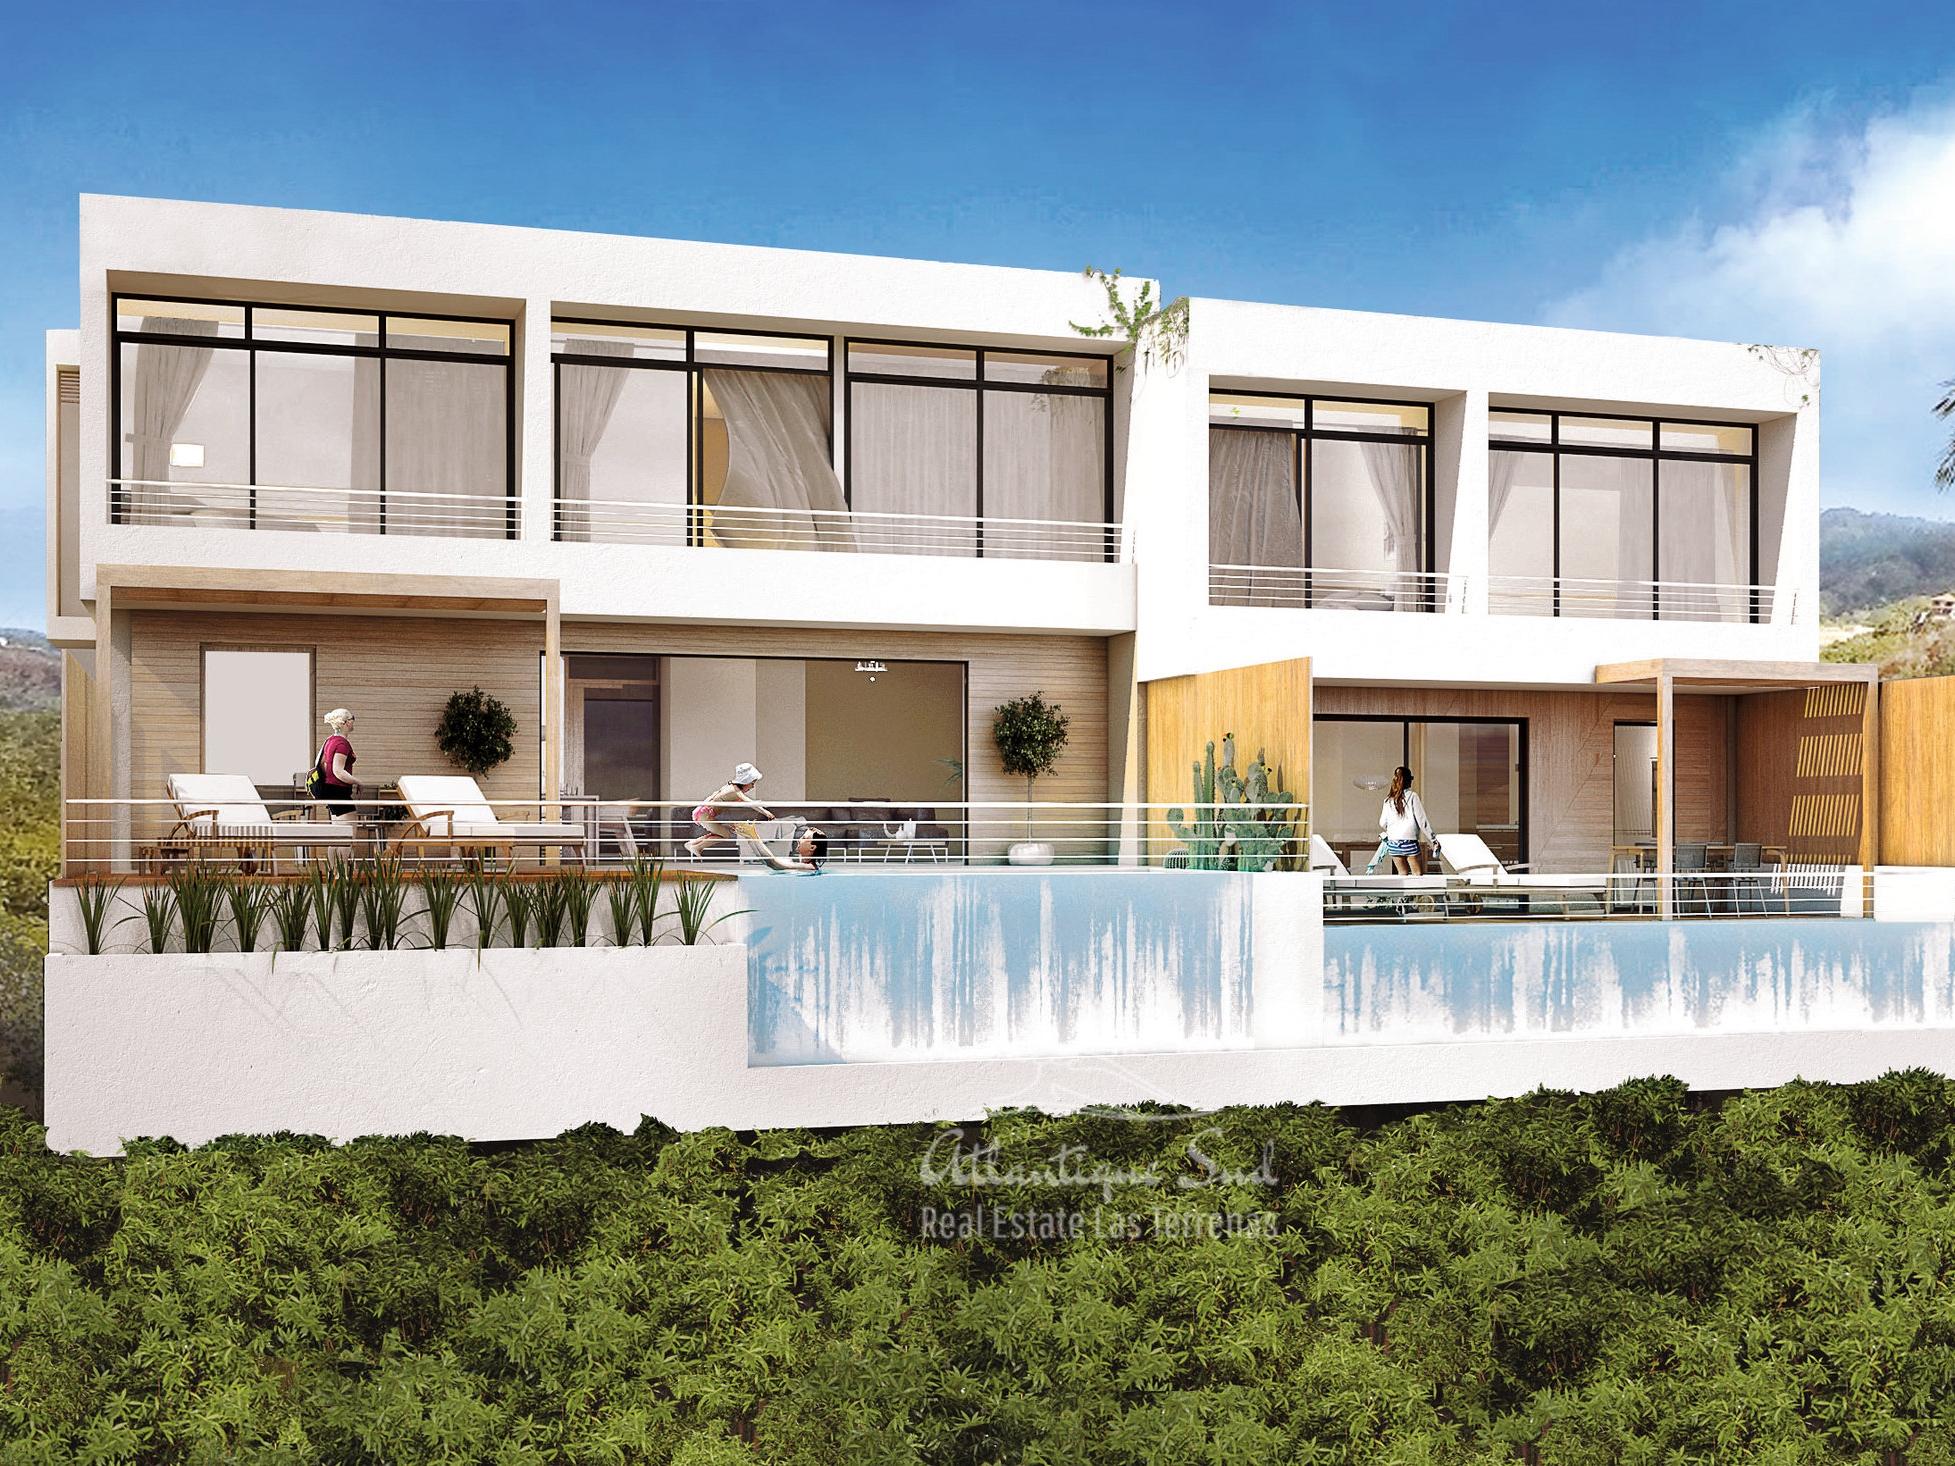 Hillside Townhouses with amazing ocean views in Las Terrenas Real Estate Dominican Republic8.jpg